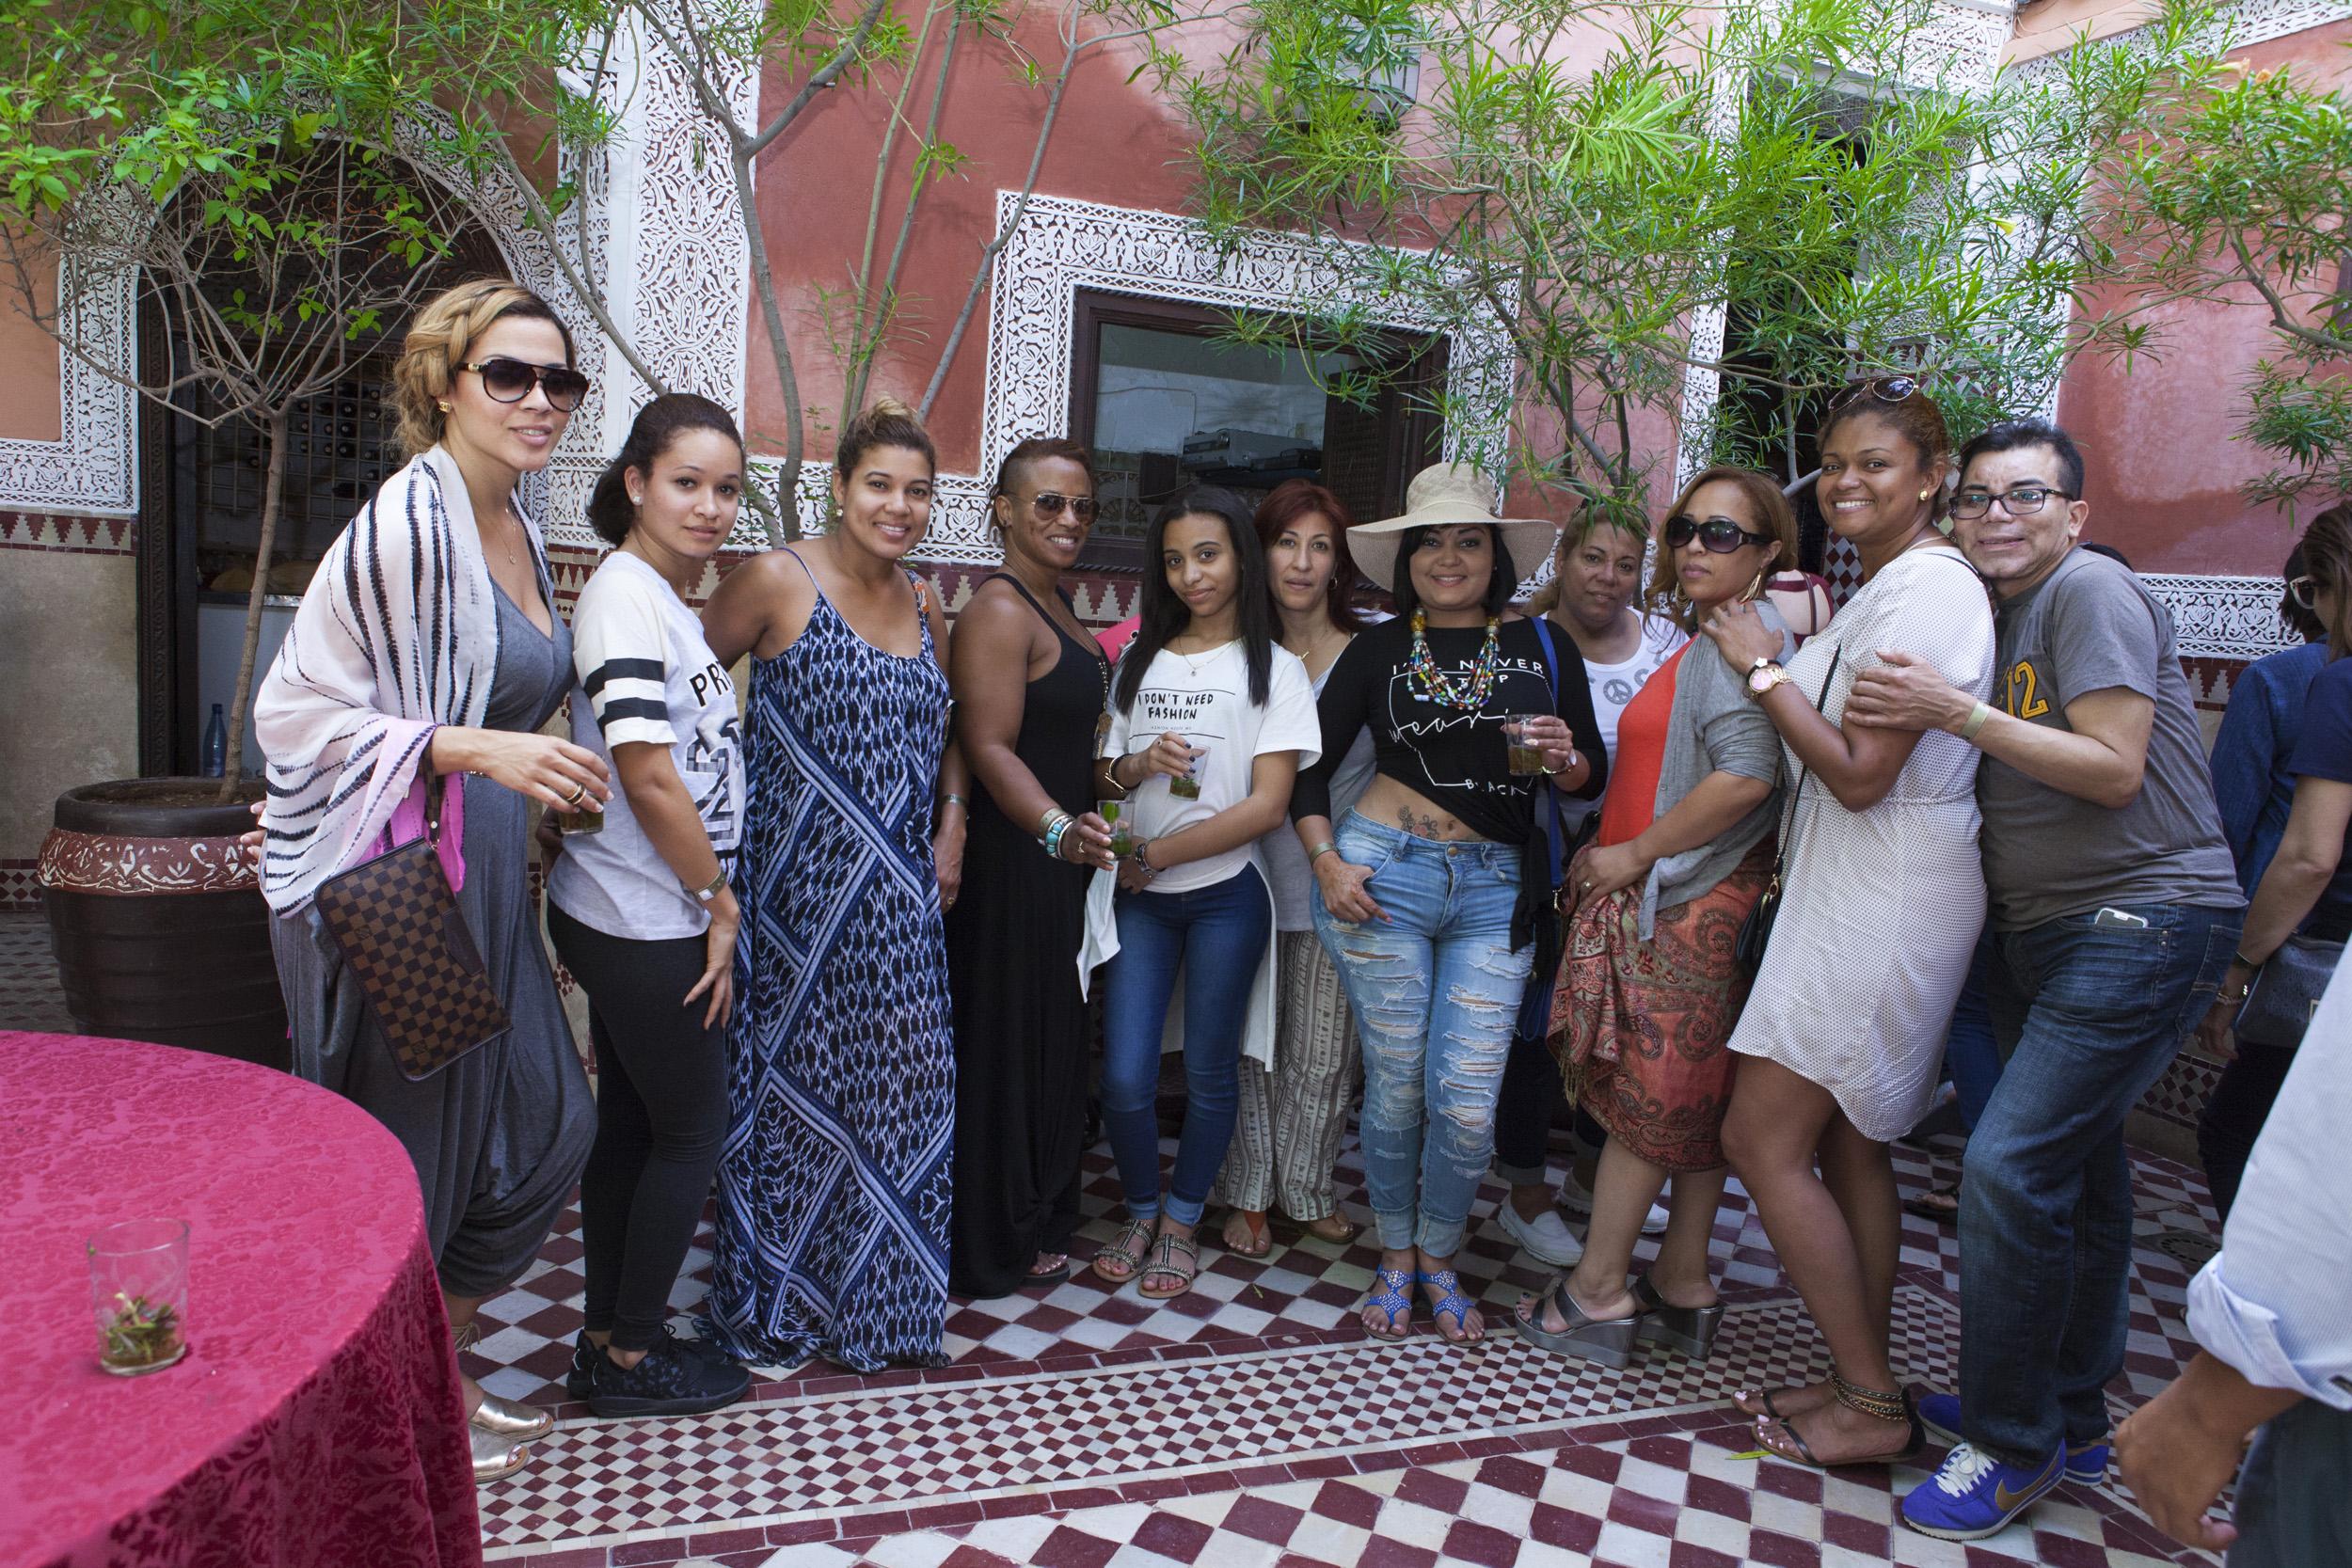 marrakech_2_convencion_anual_salerm_cosmetics_proline_30